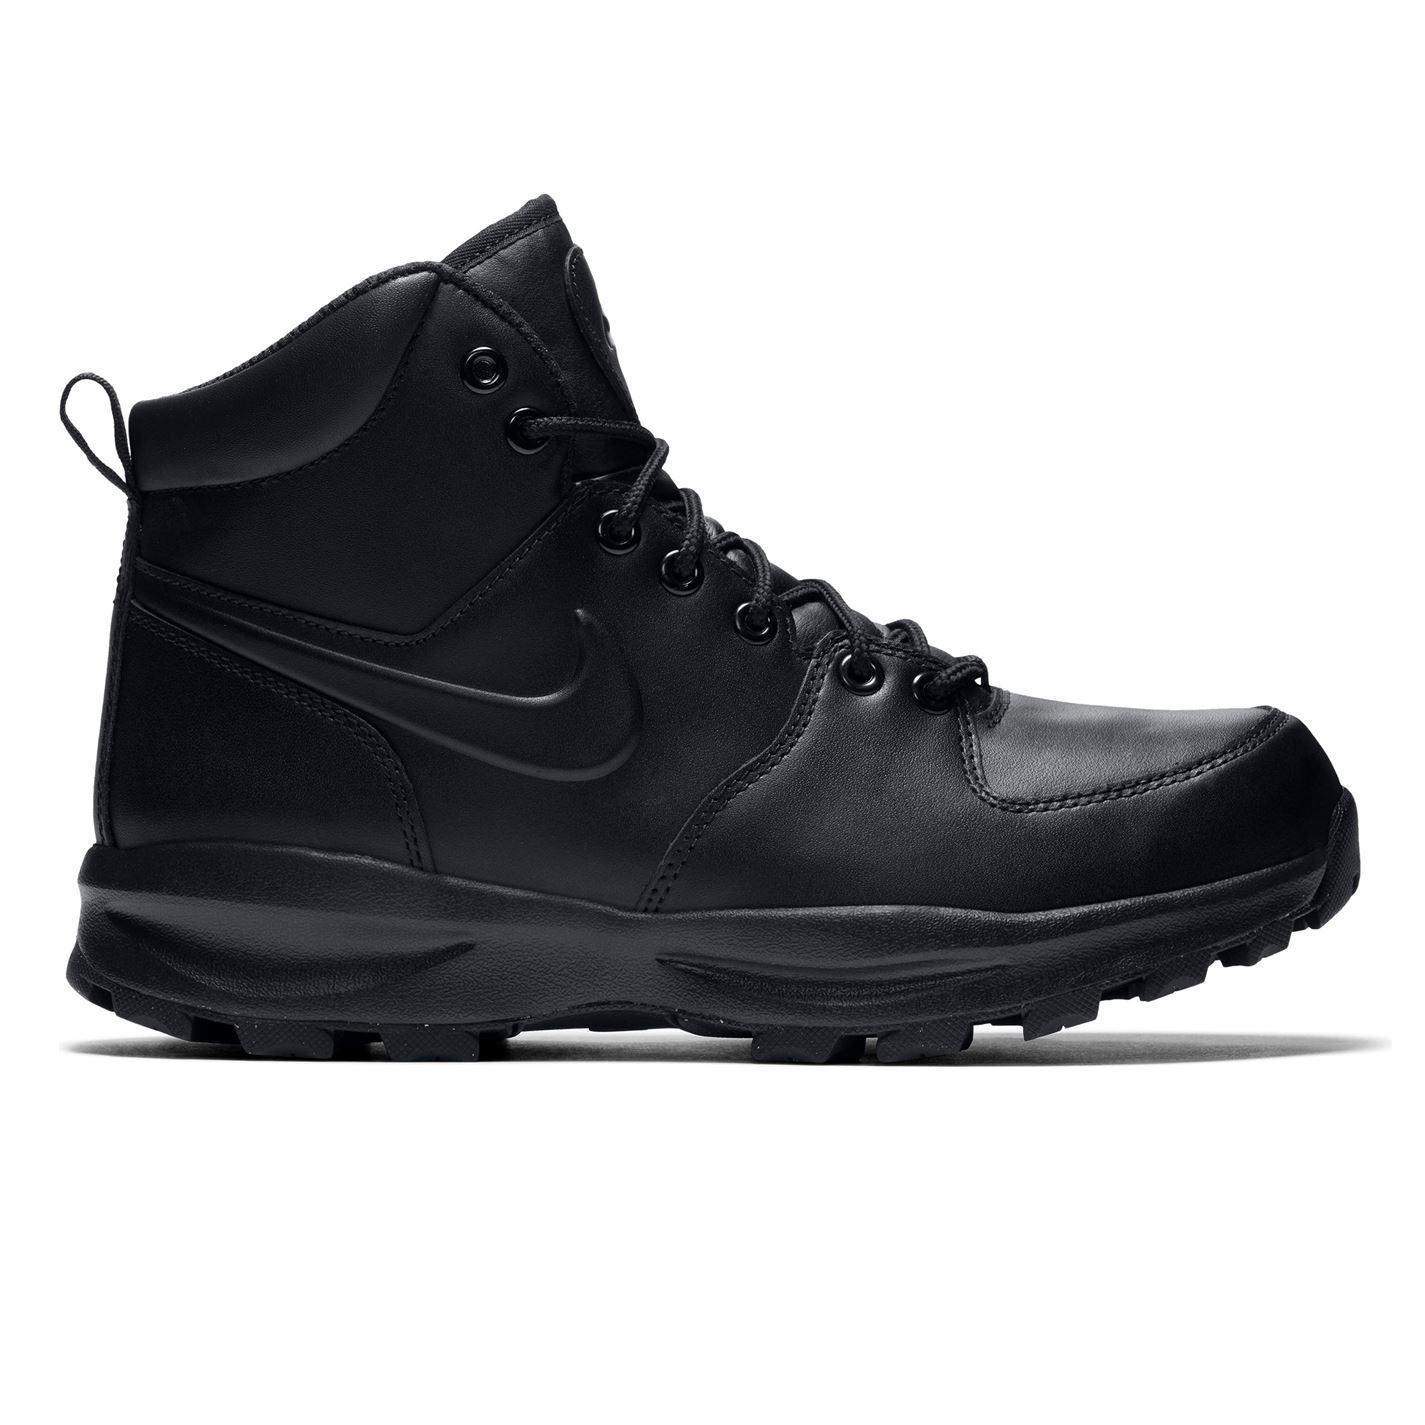 Nike Manoa Leather Men s Boots Black Blk Wht - Glami.sk 69bde952fc4